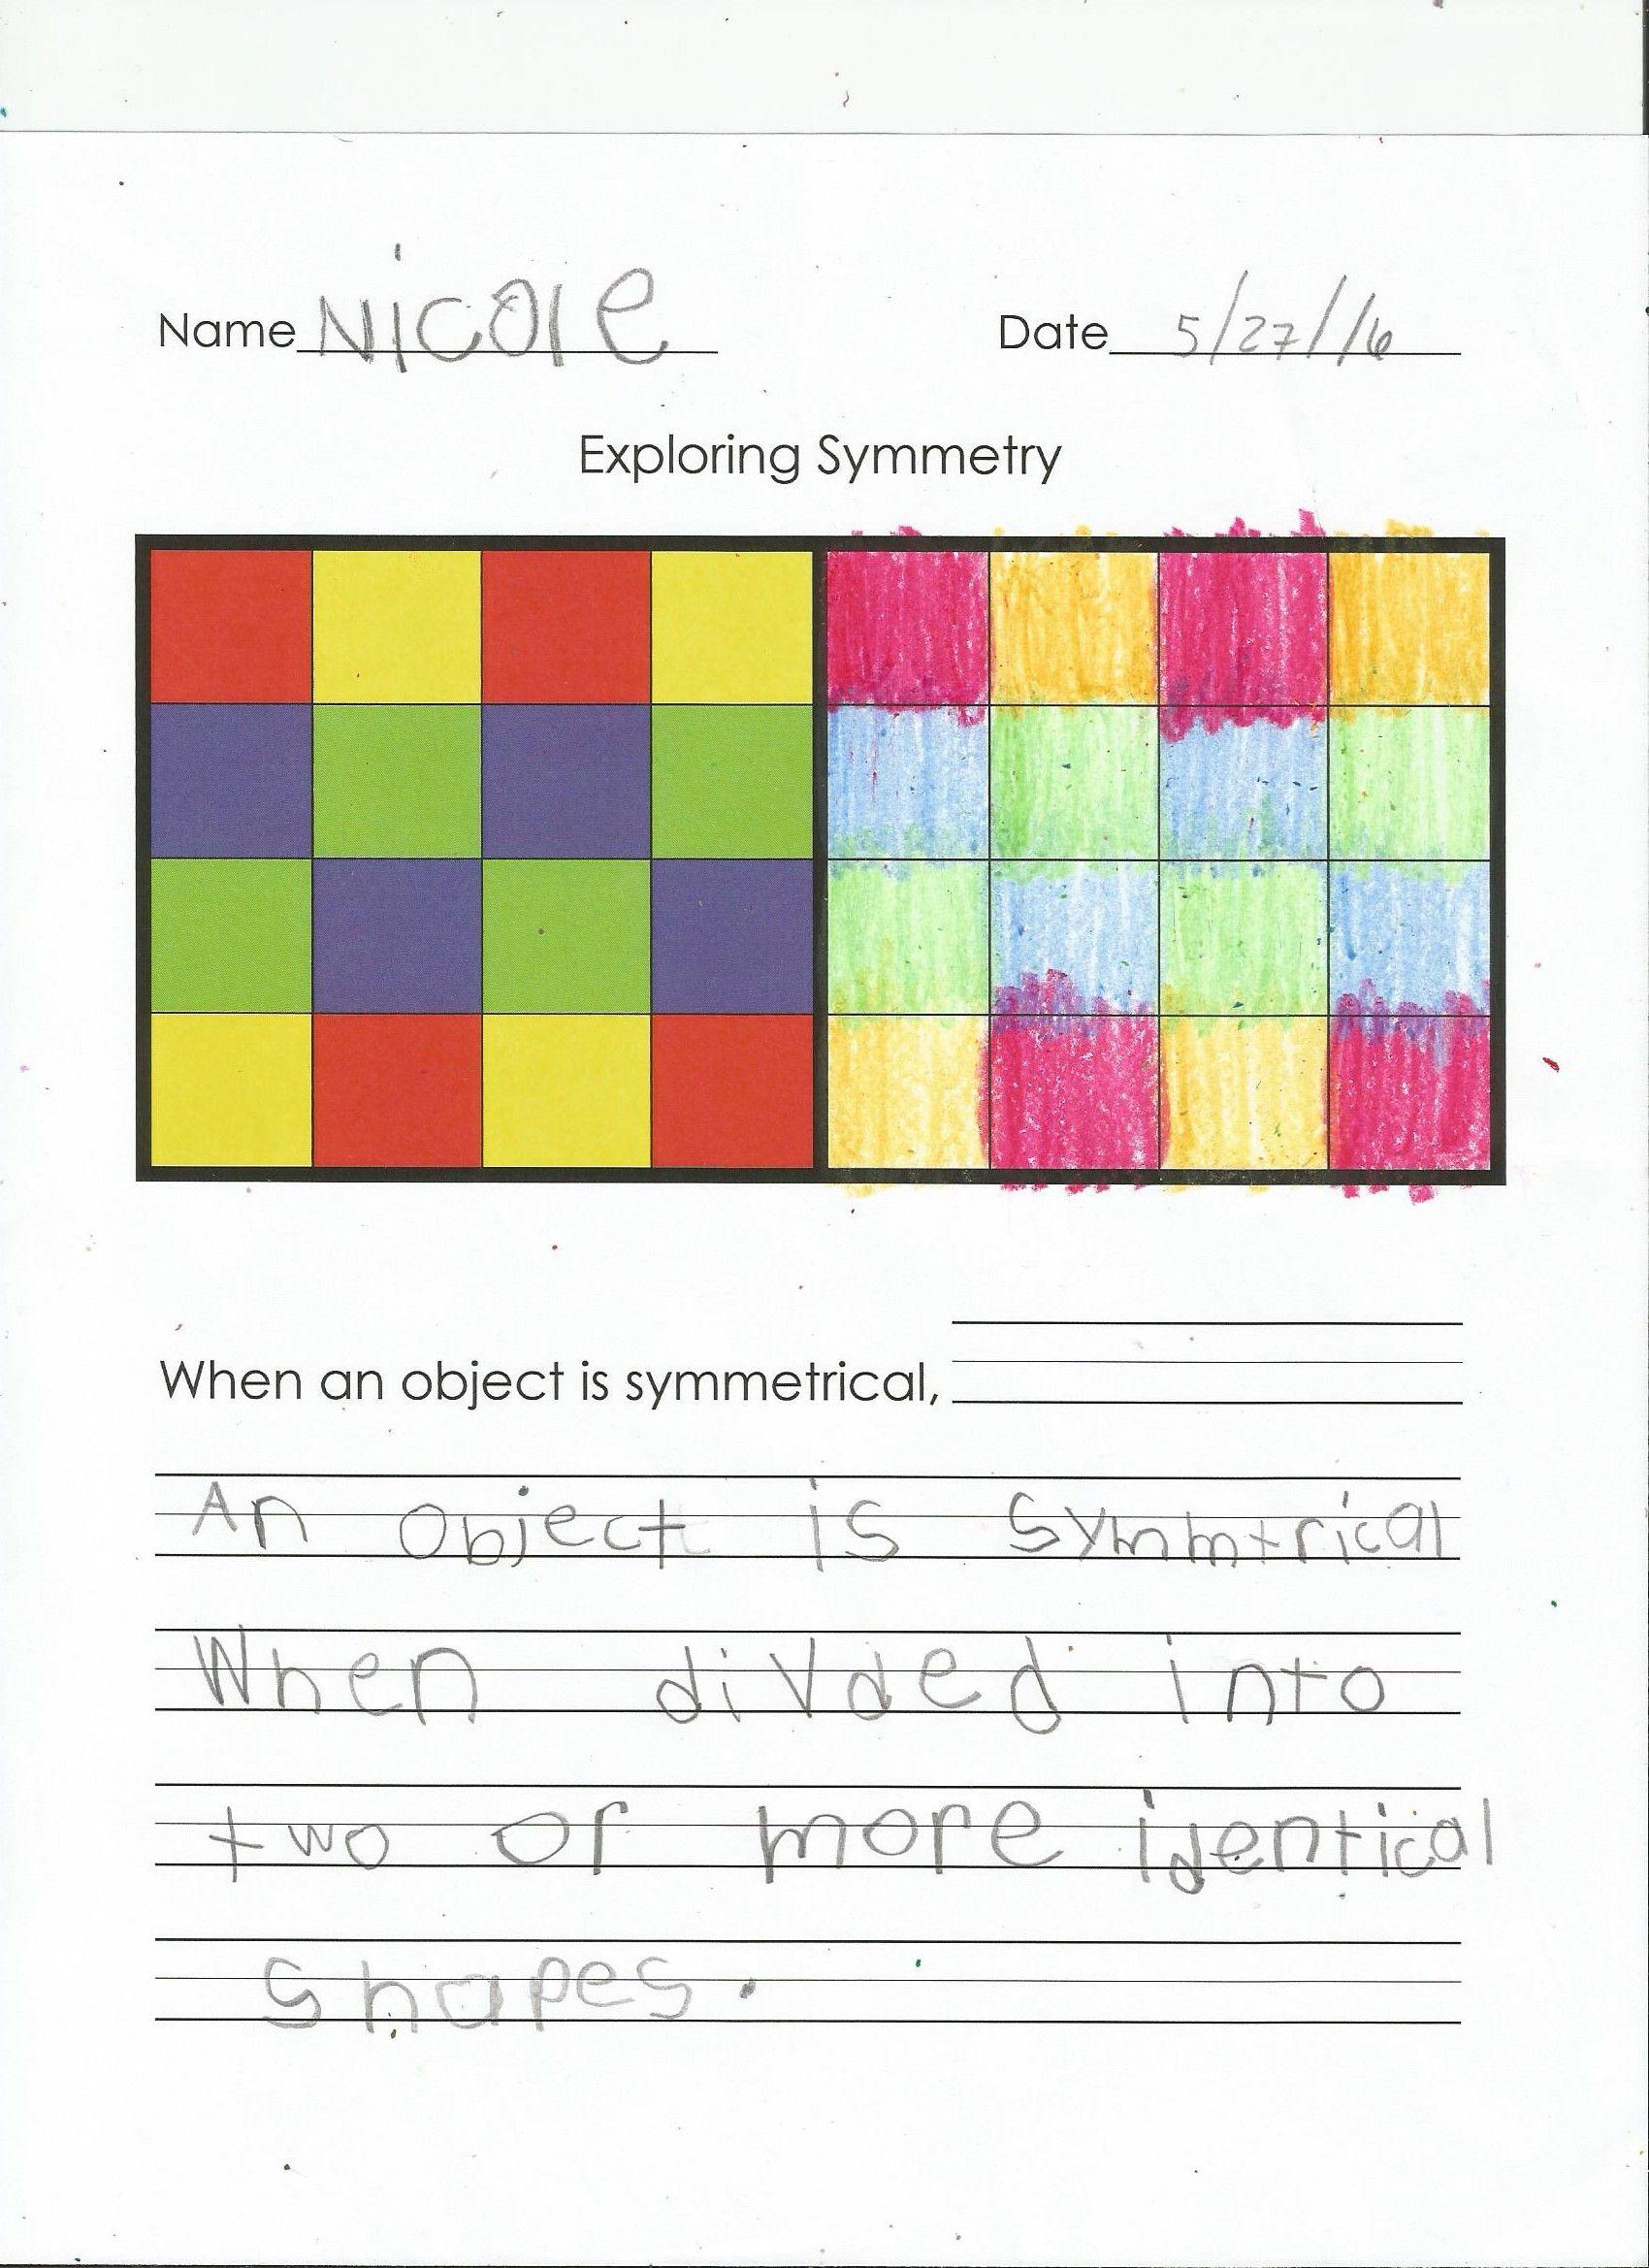 Exploring Symmetry Activity